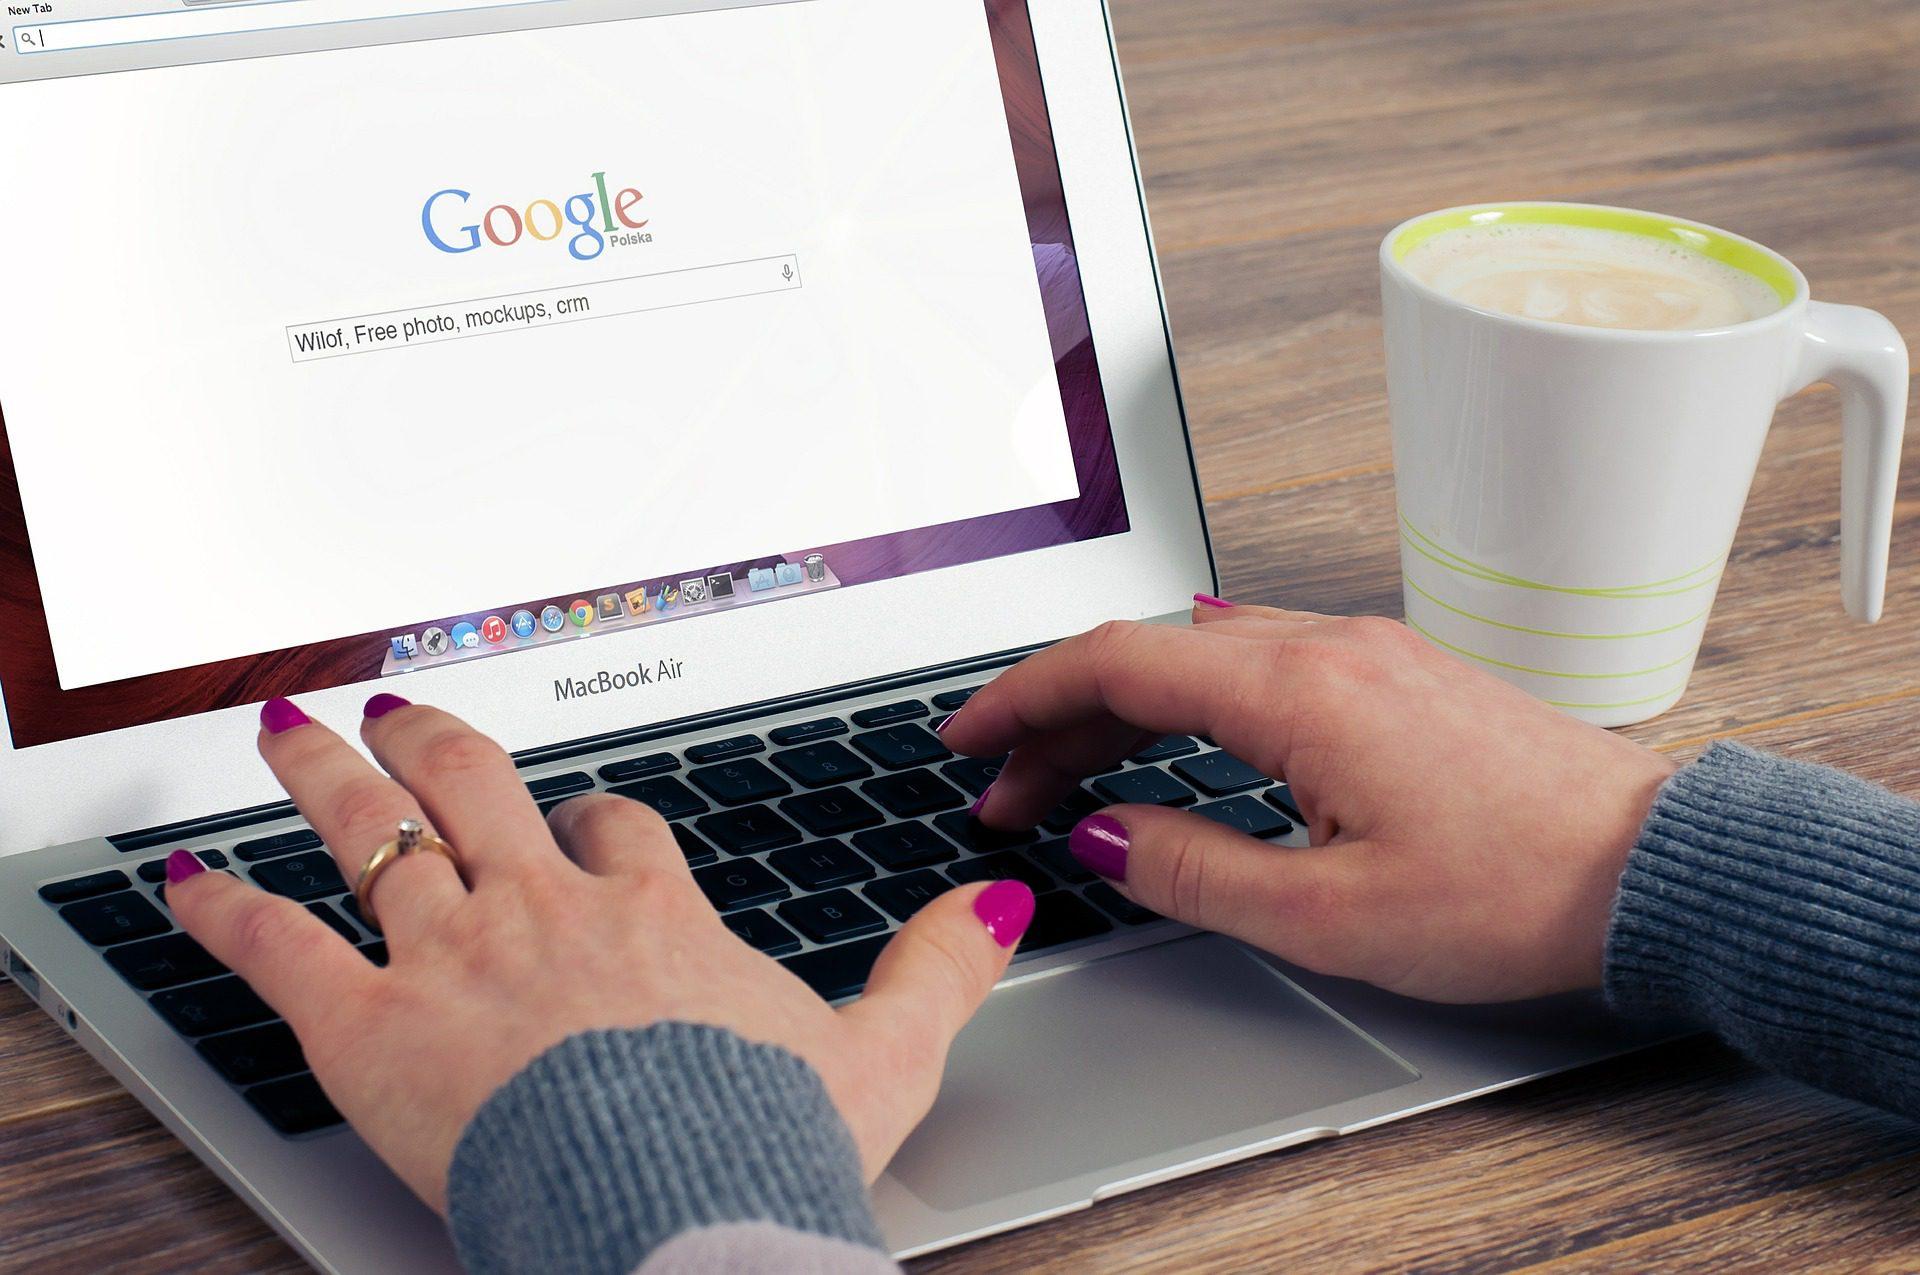 Google Search on MacBook